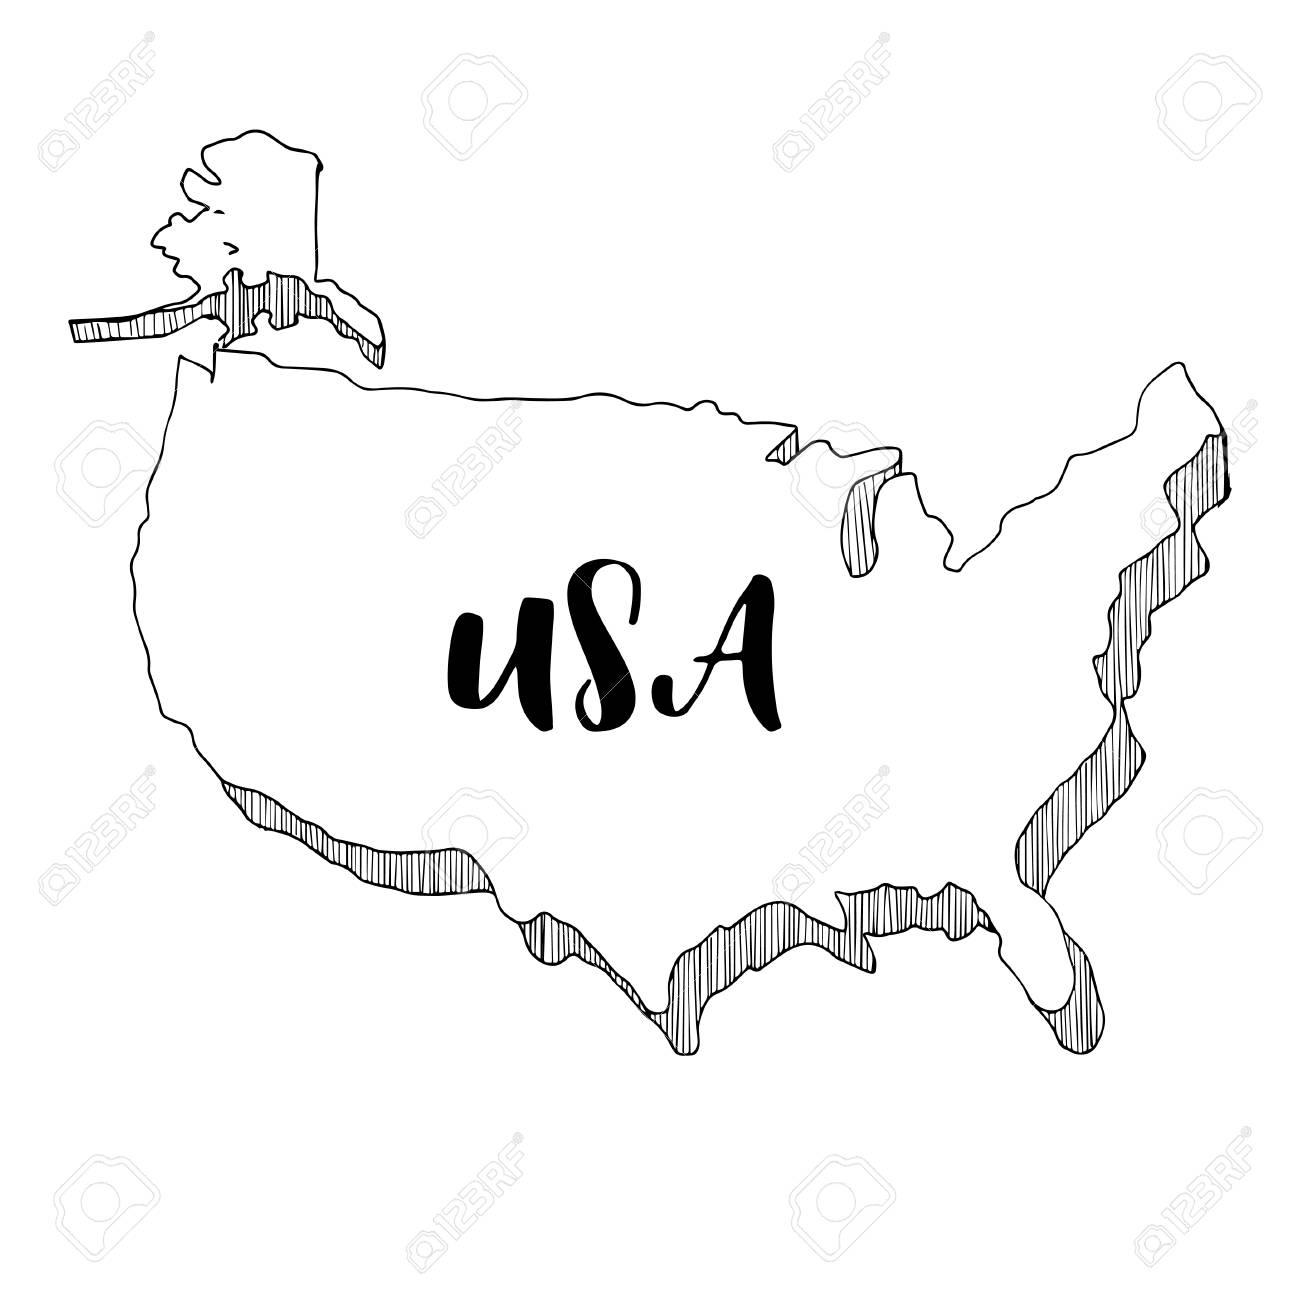 Hand Drawn Of USA Map, Vector Illustration Royalty Free Cliparts ...